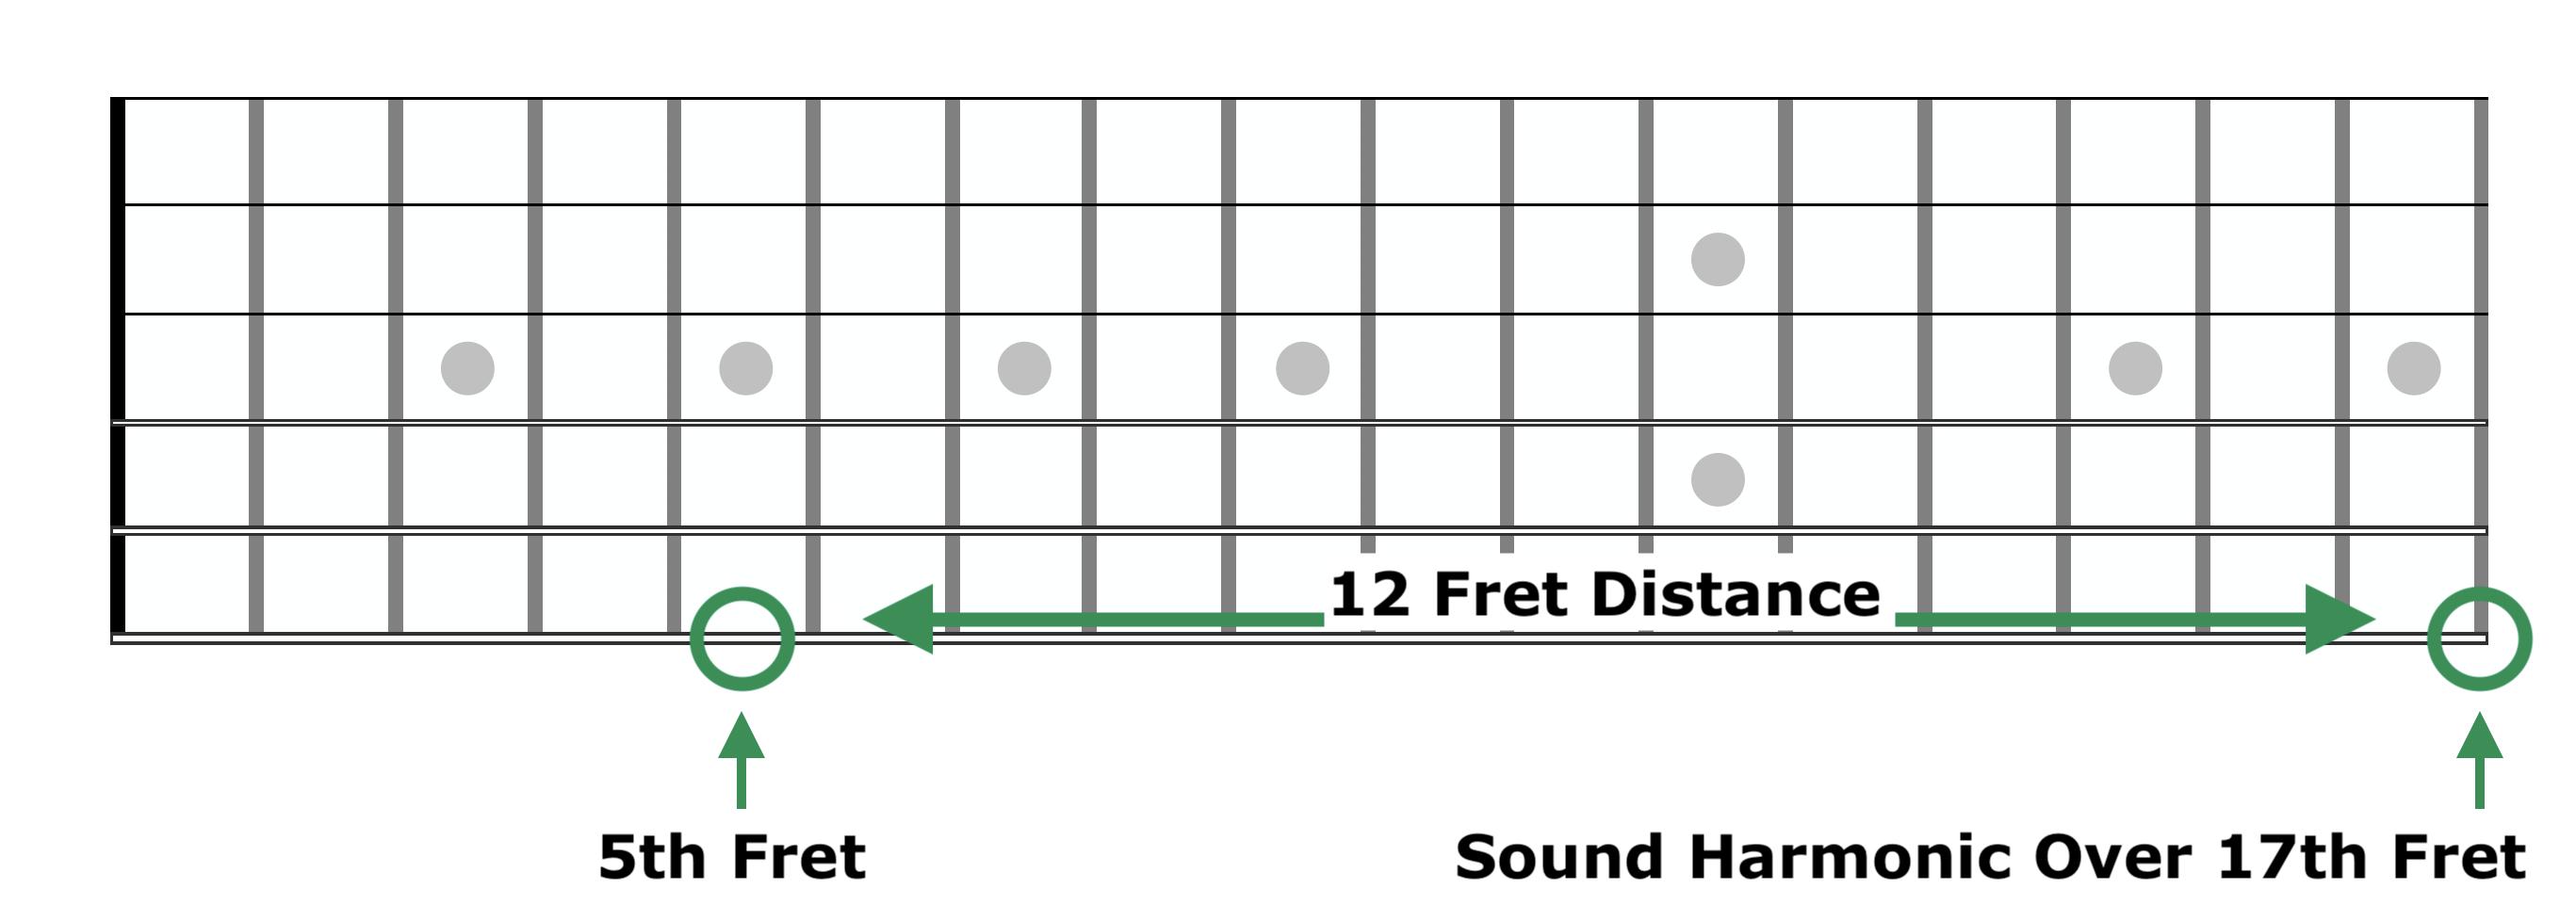 Harp Harmonic Fretboard Diagram 3